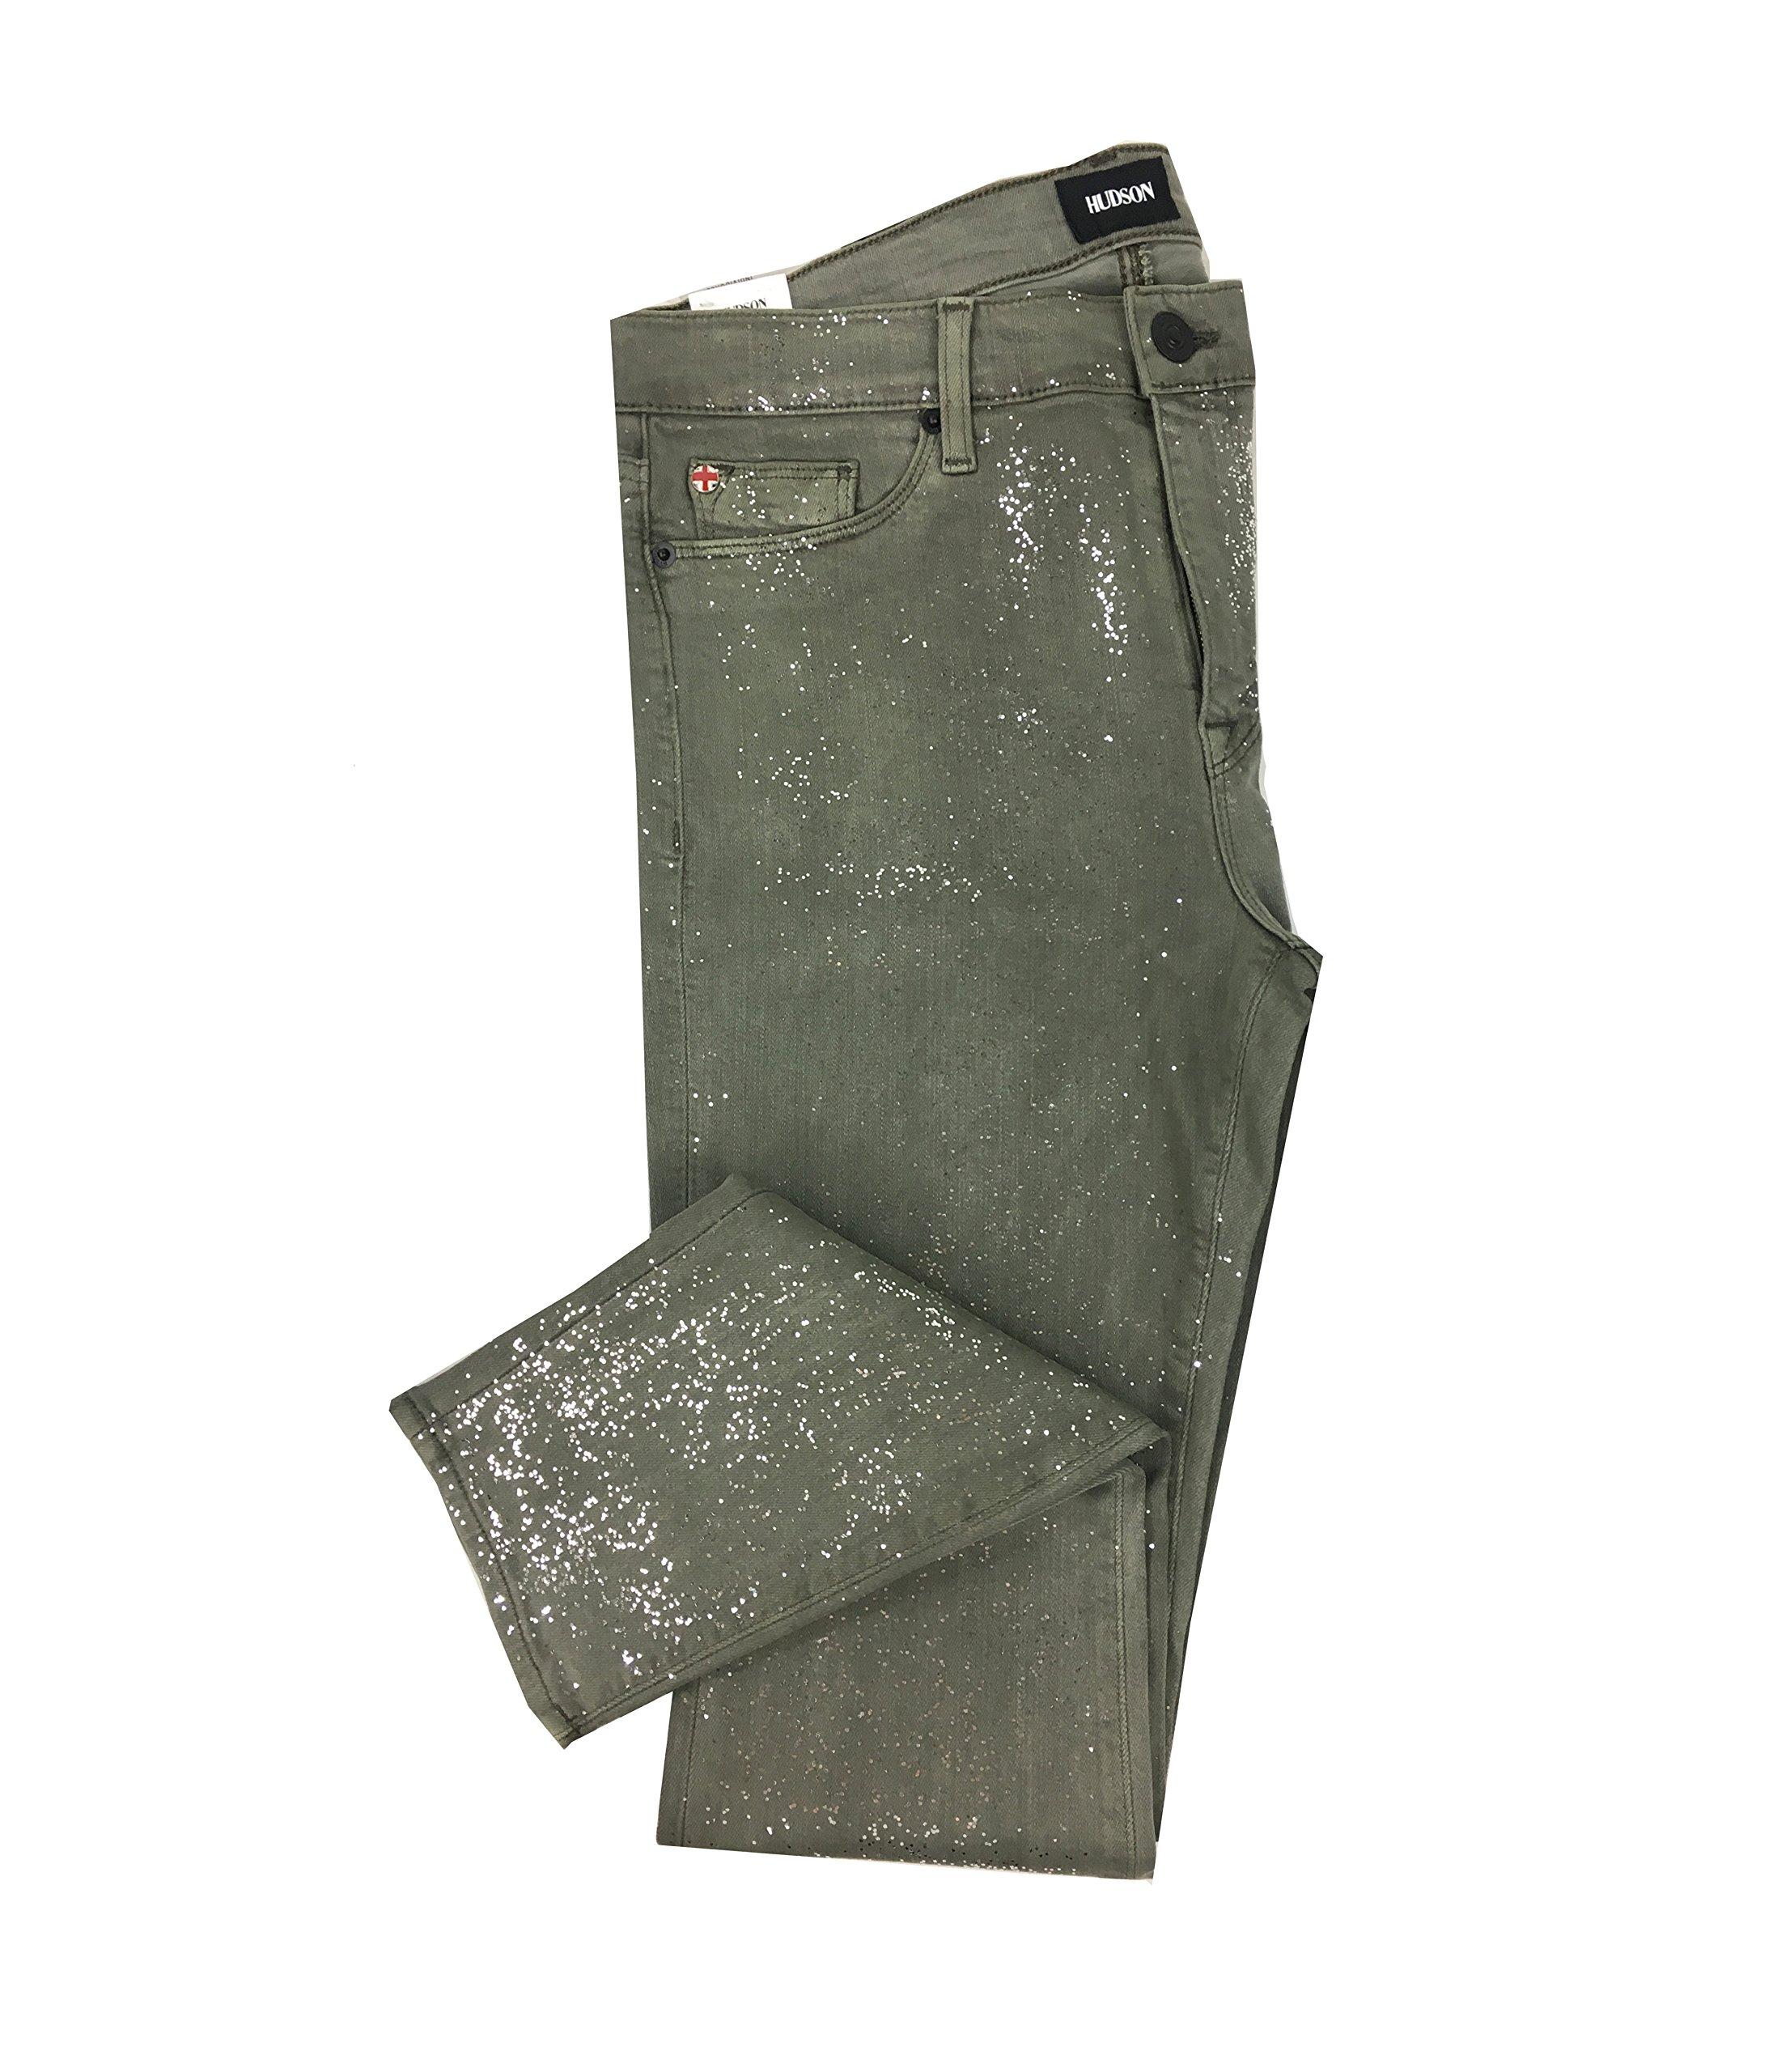 Hudson Women's Nico Midrise Ankle Super Skinny Glitter Jeans (31, Trooper Green)